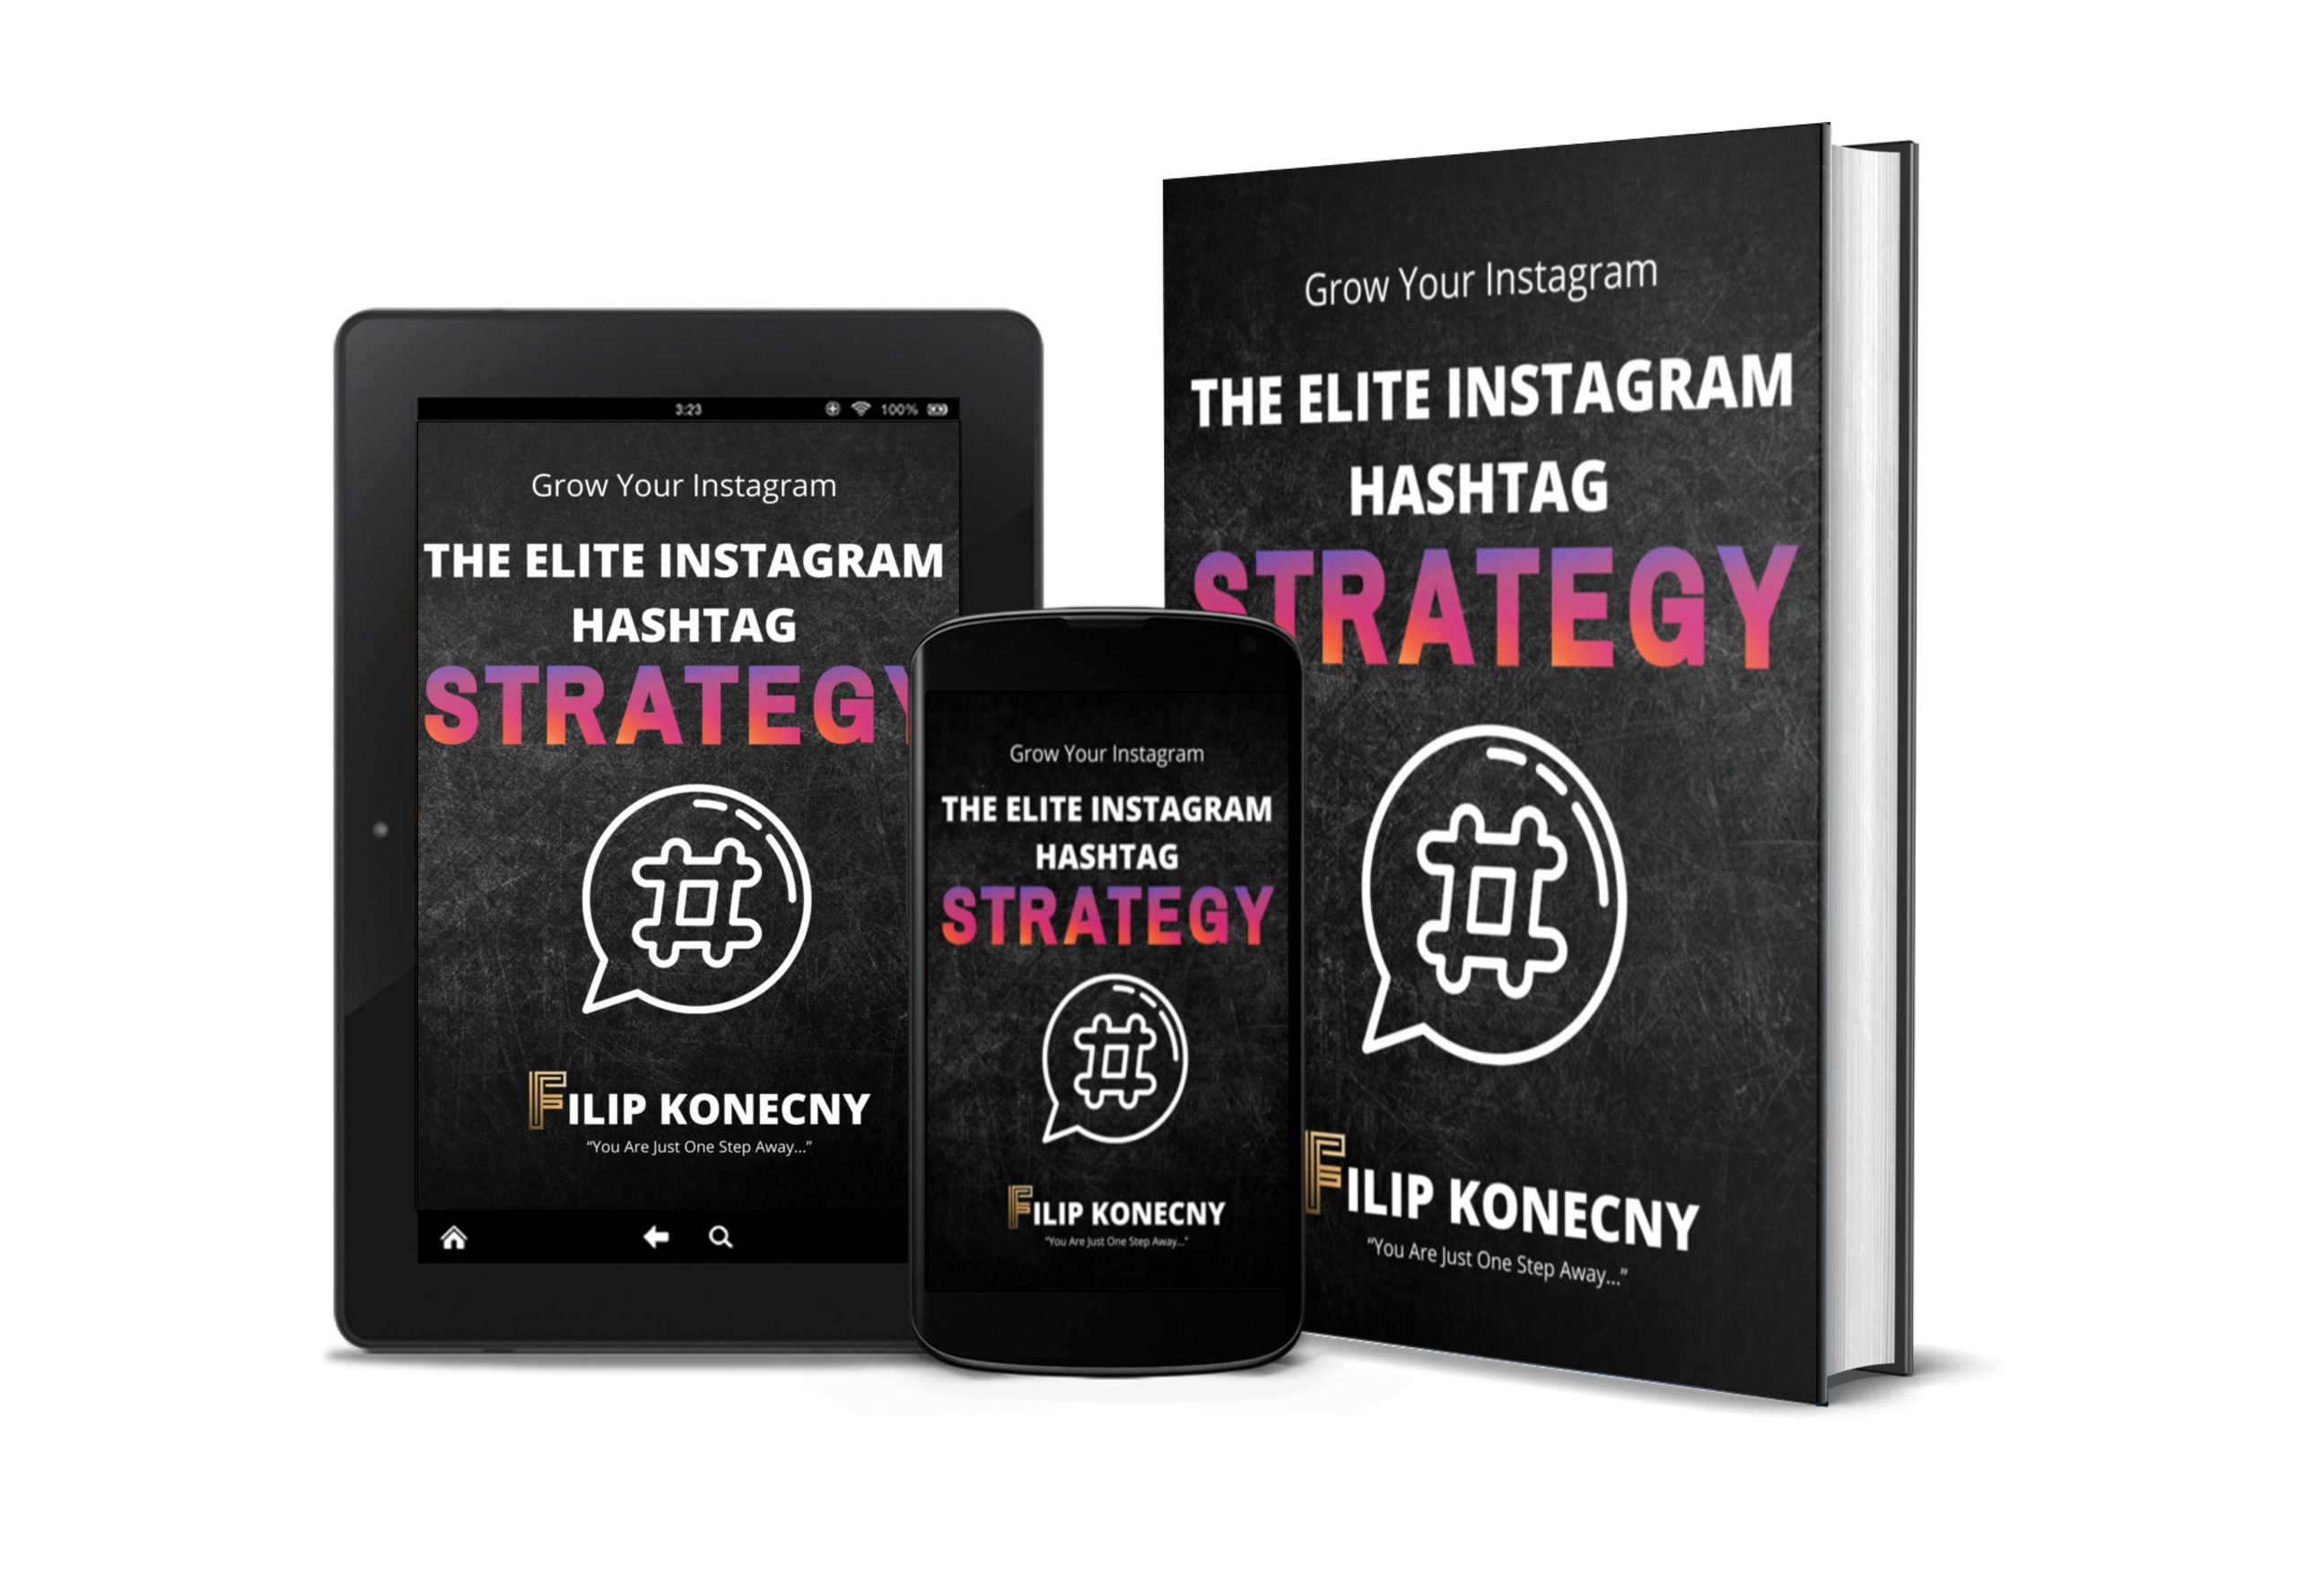 elite instagram hashtag strategy e-book